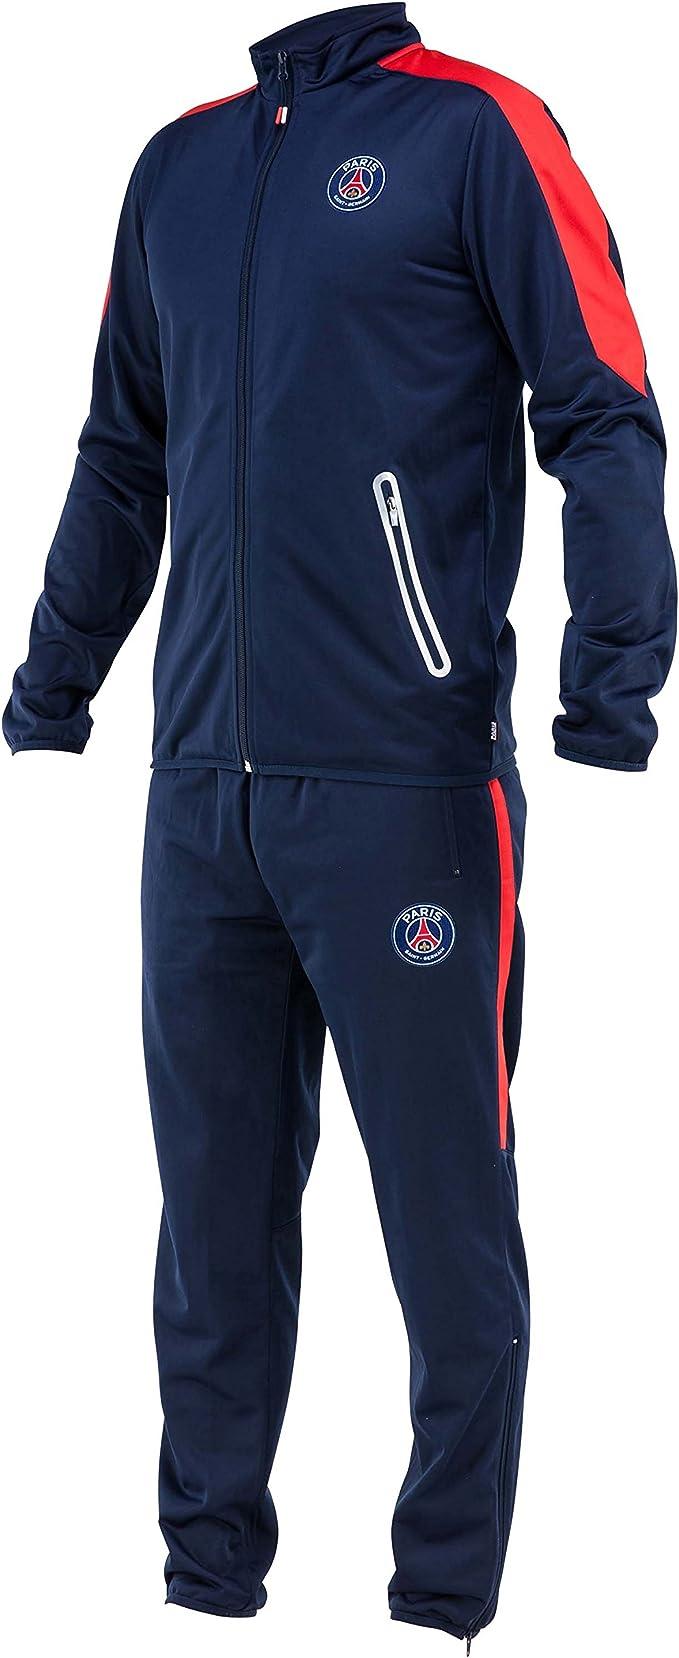 paris saint germain trainingsanzug mit motiv offizielle kollektion kindergrosse fur jungen